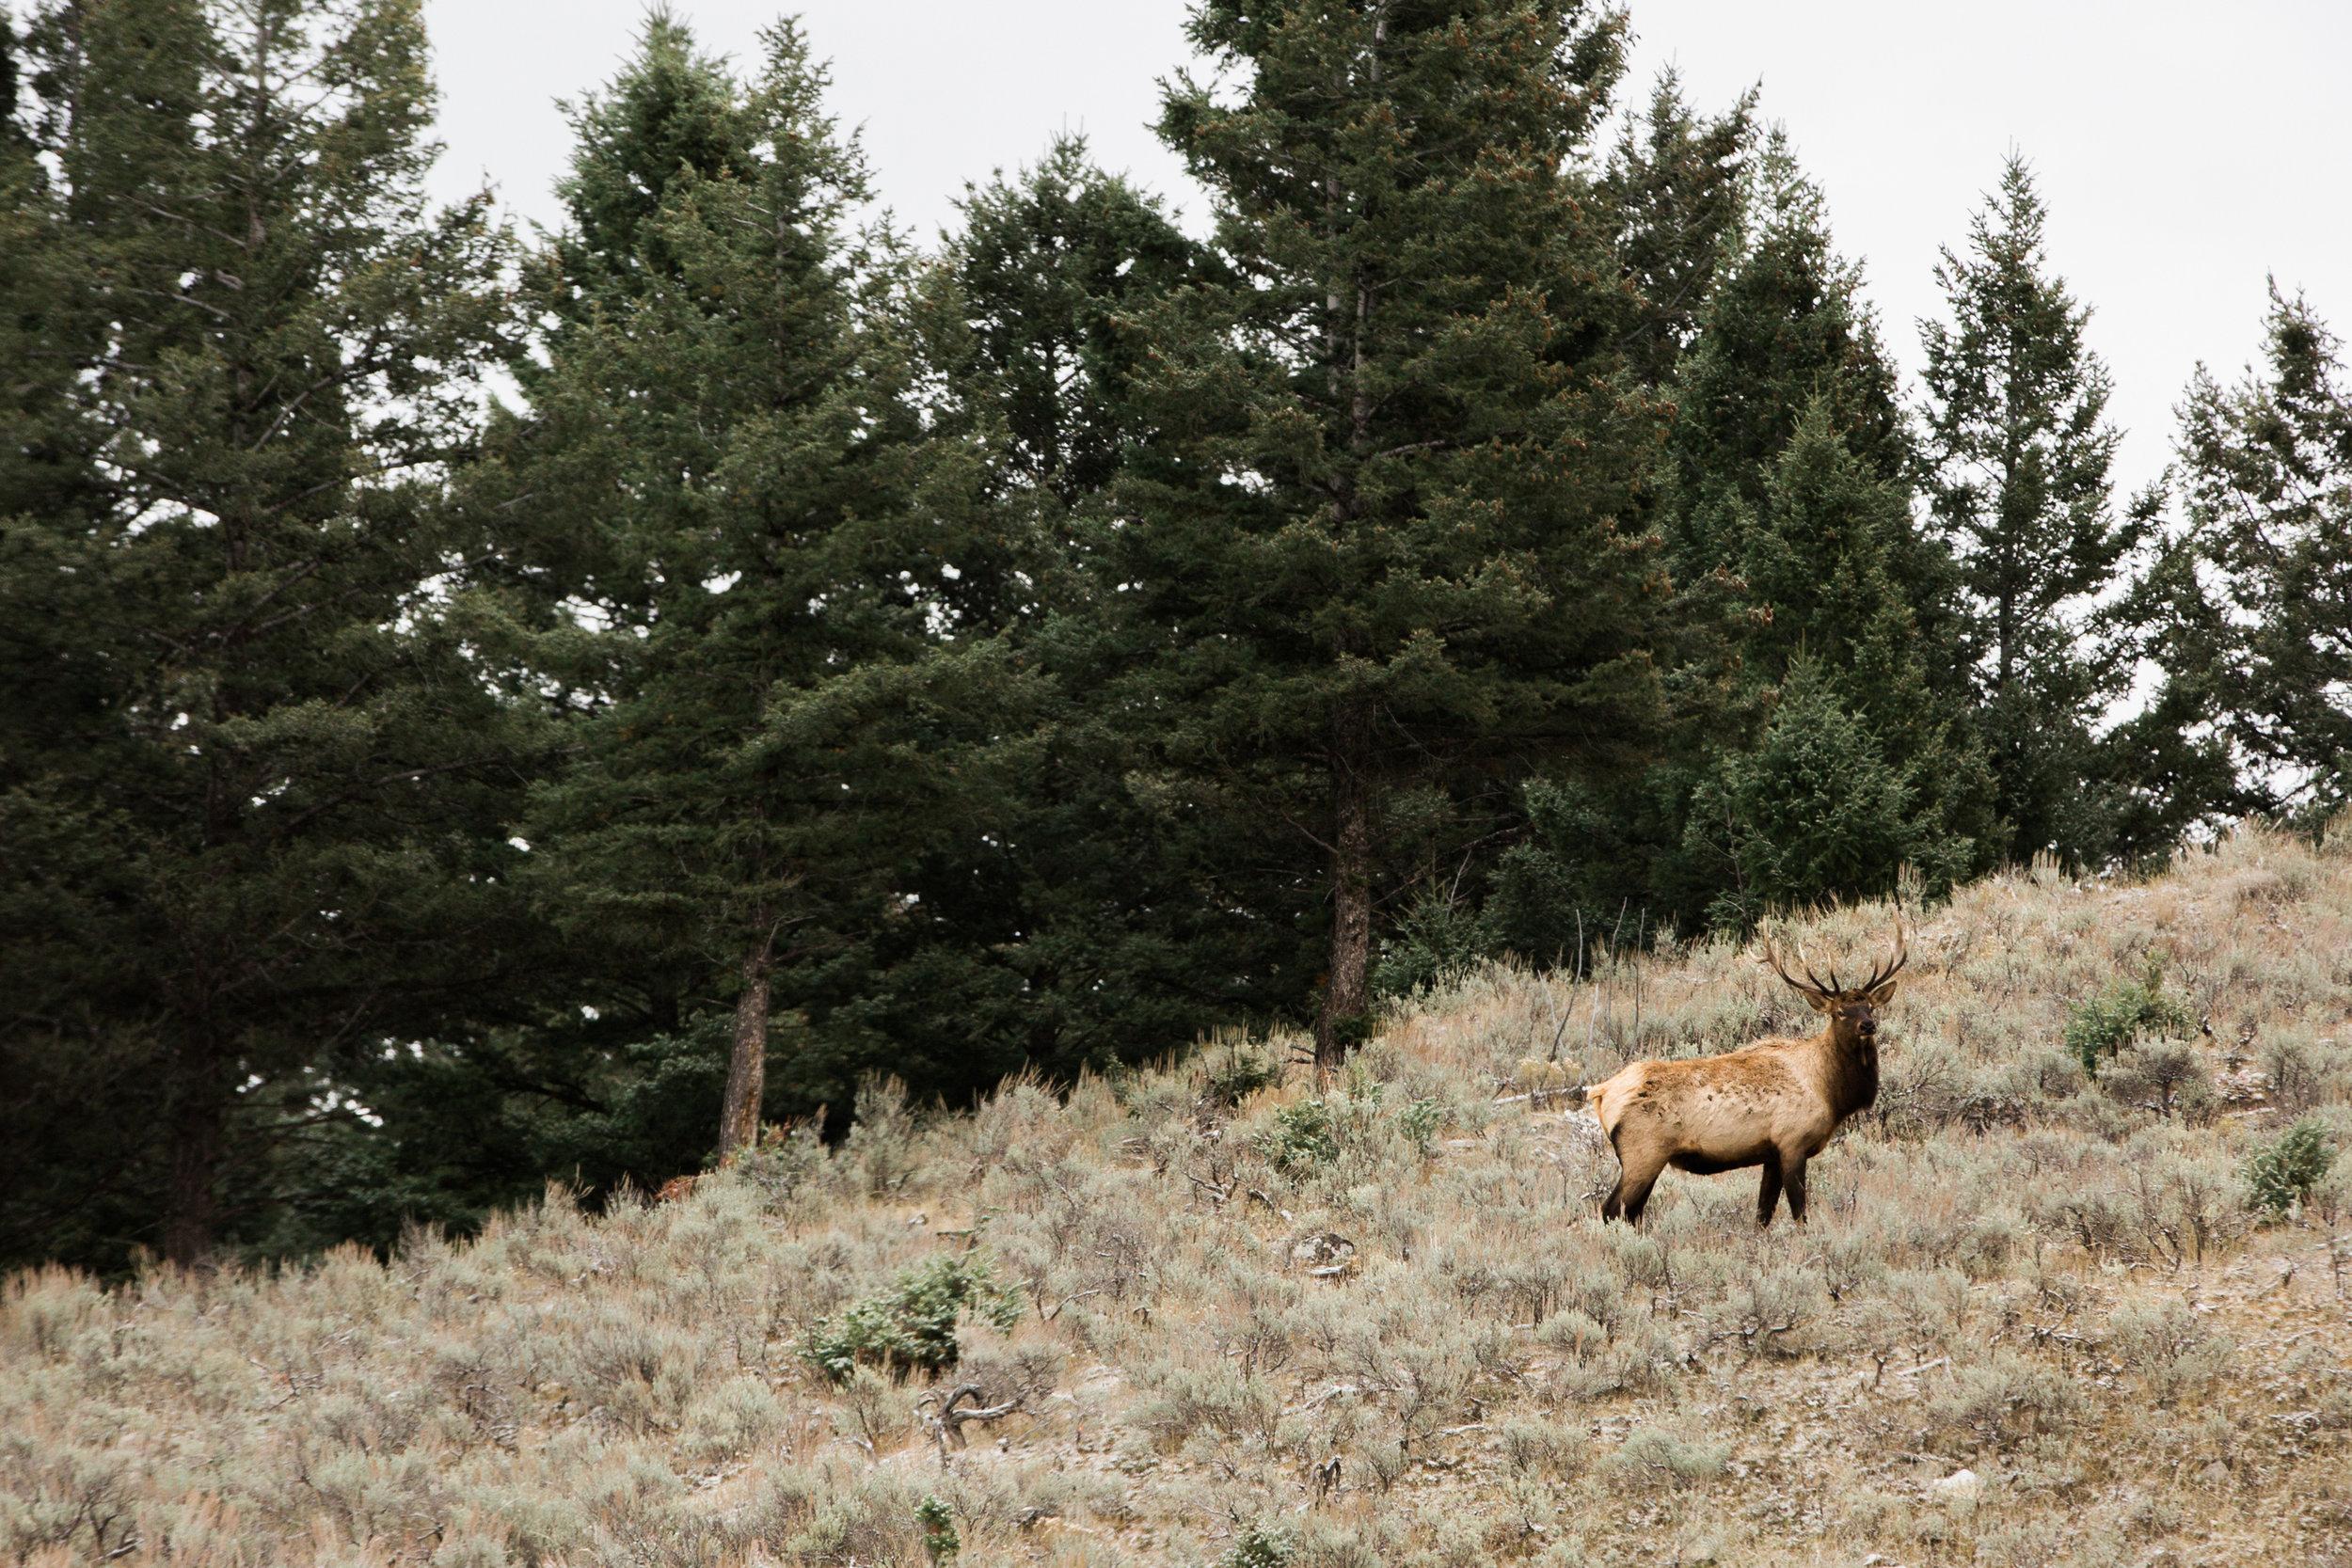 CindyGiovagnoli_outdoor_adventure_photography_Grand_Teton_Yellowstone_Glacier_National_Park_Montana_Wyoming_South_Dakota_Mount_Rushmore_Badlands-021.jpg